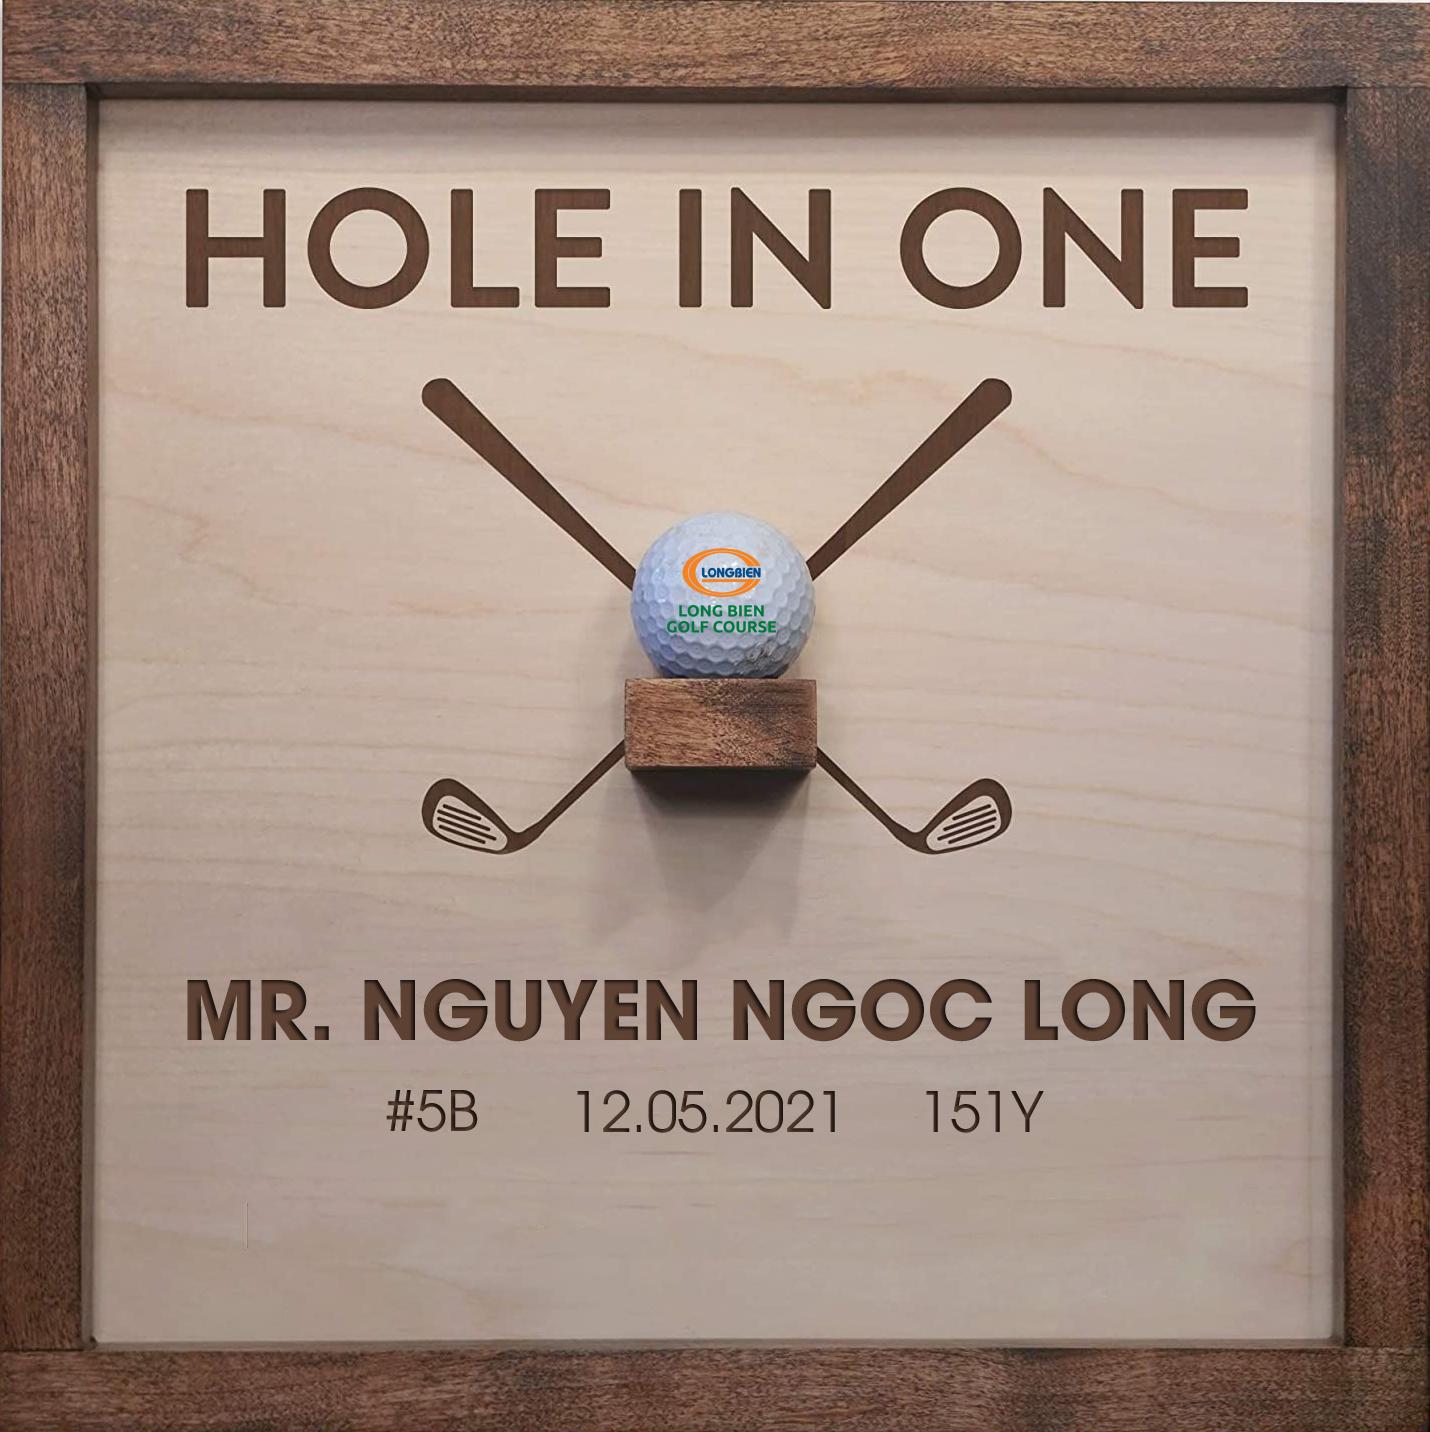 HOLE IN ONE BỞI GOLFER NGUYỄN NGỌC LONG